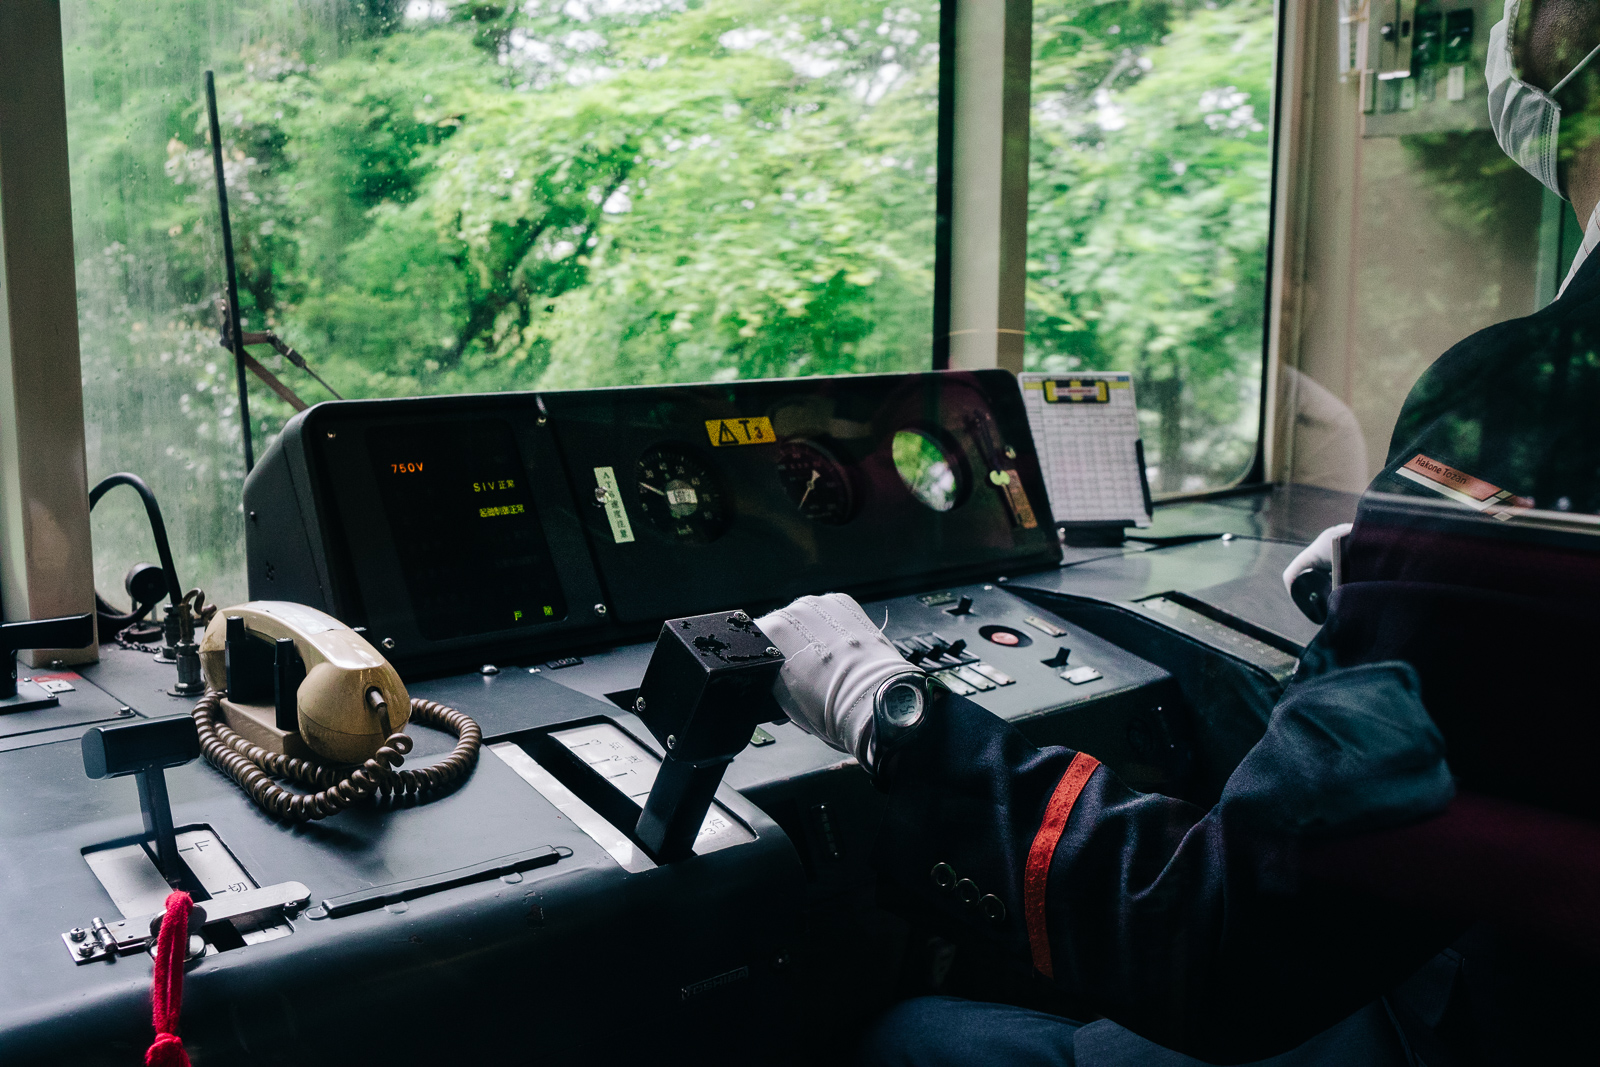 Train Conductor - Hakone